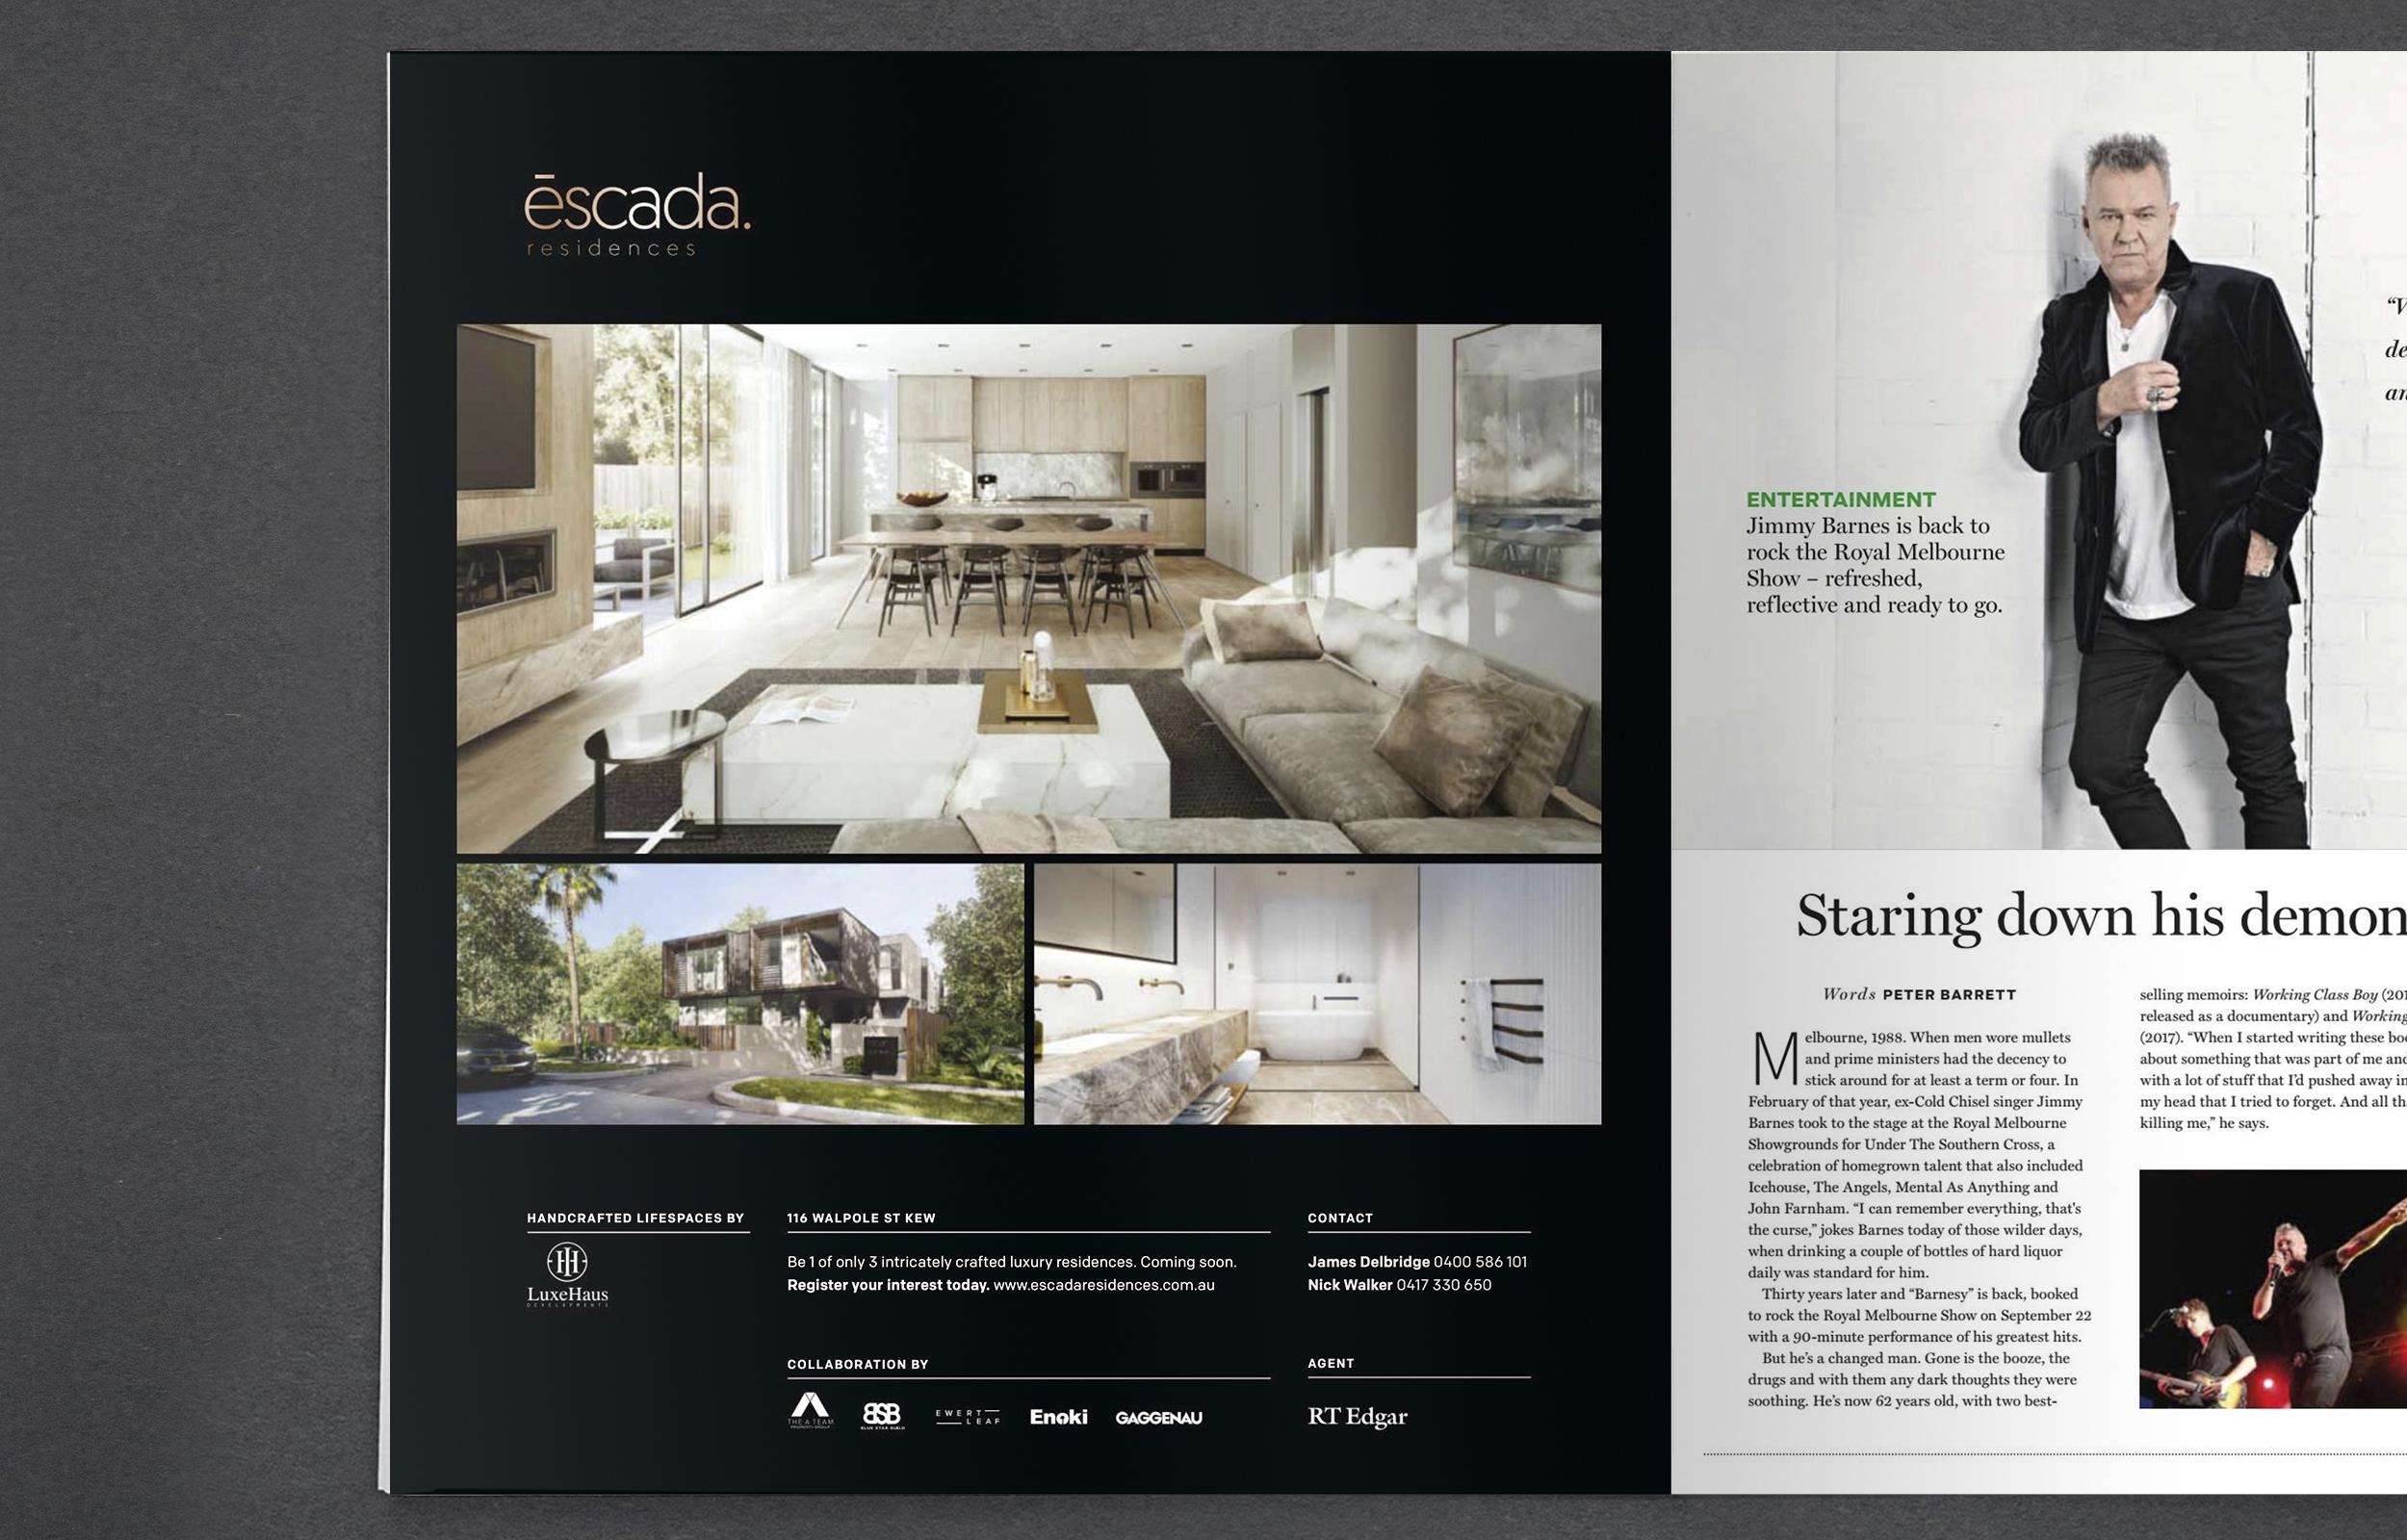 enoki-graphic-escada-4.jpg